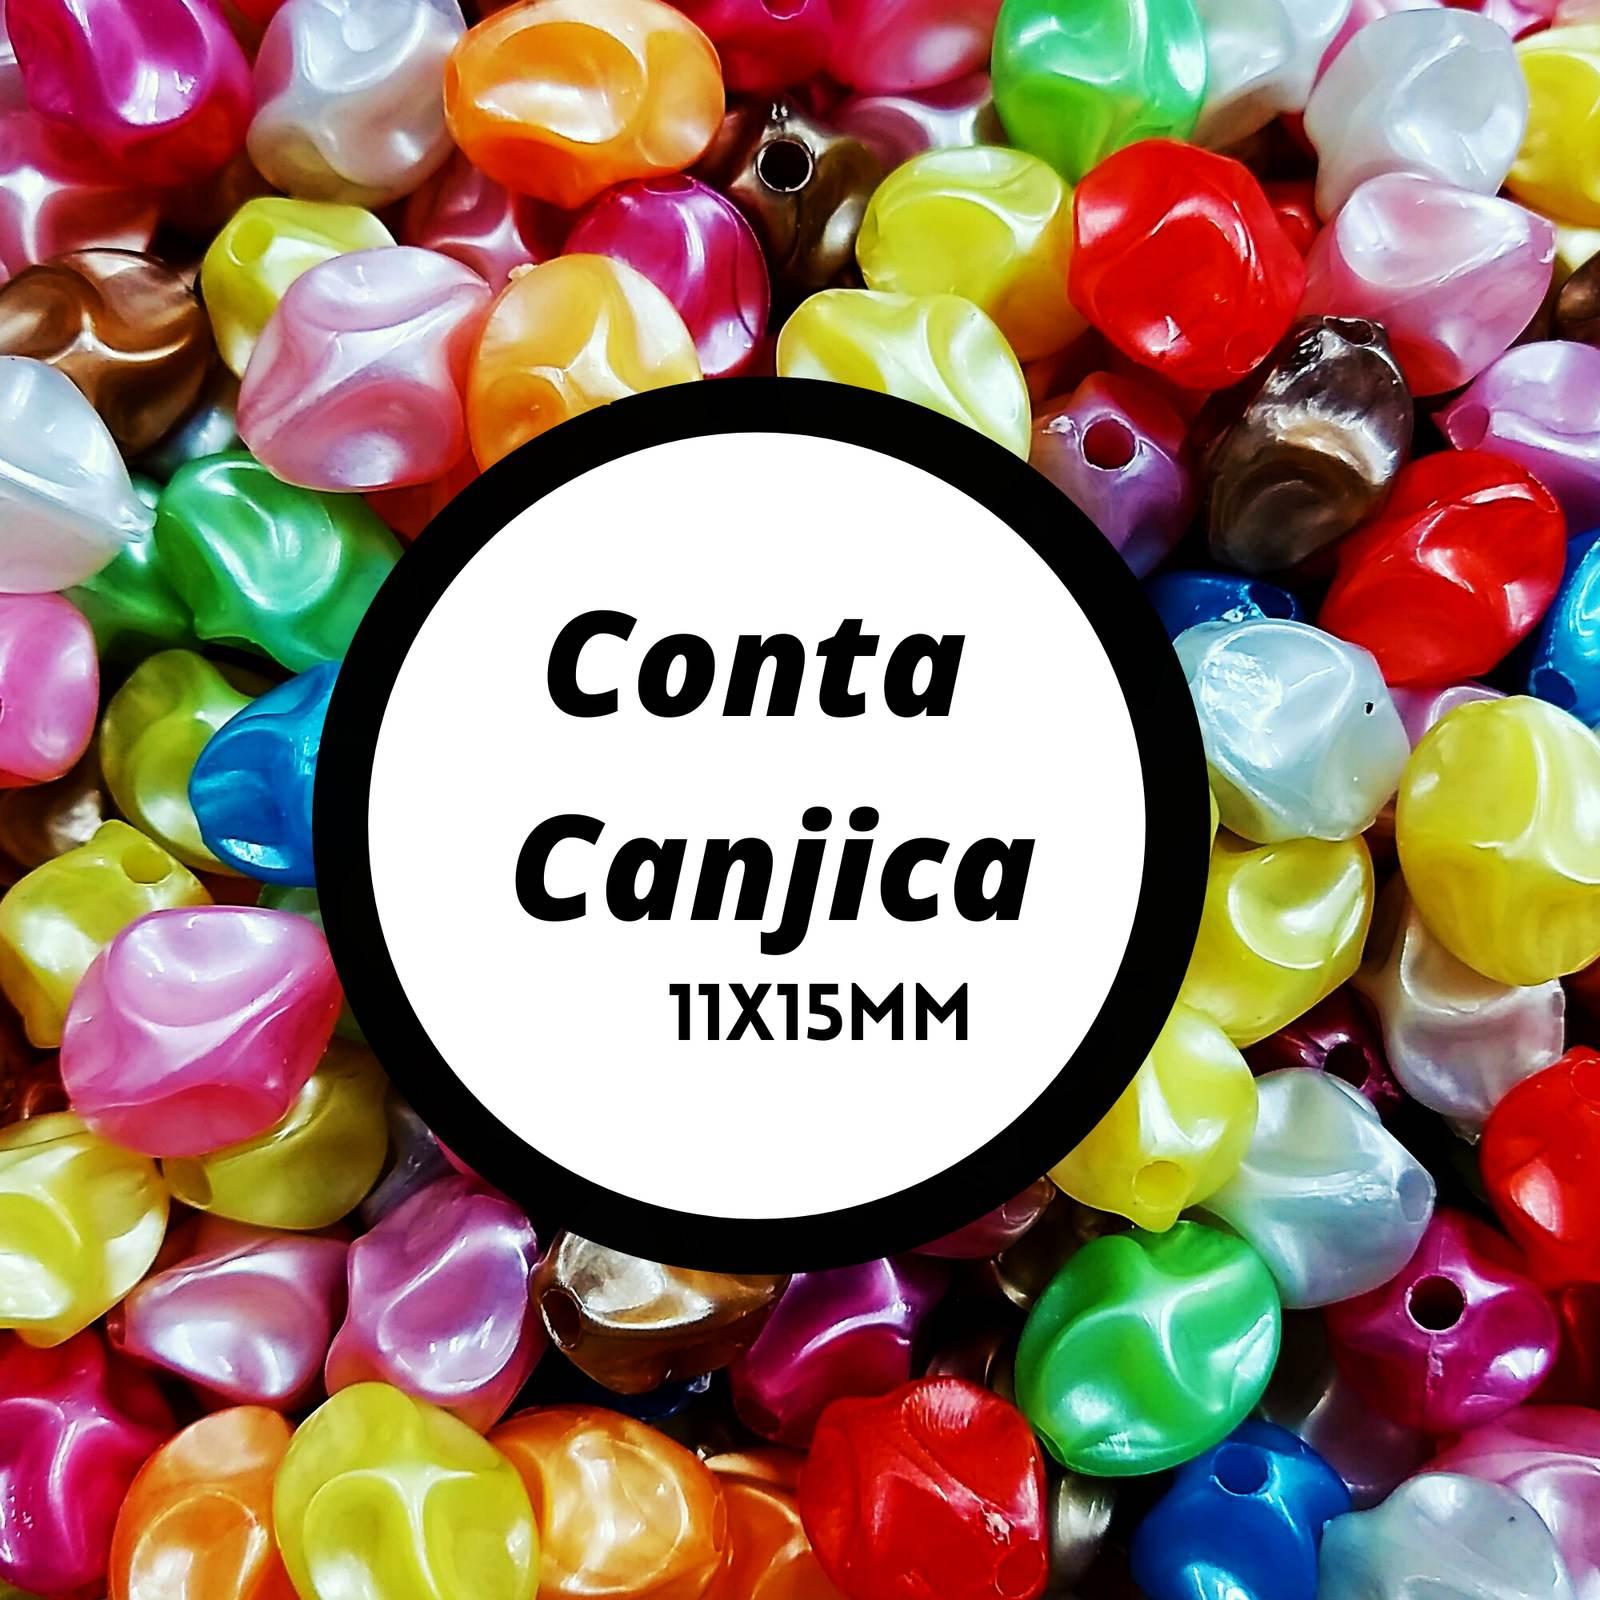 Conta  canjica Resina  Leitosa AS2949 11x15mm c/500g